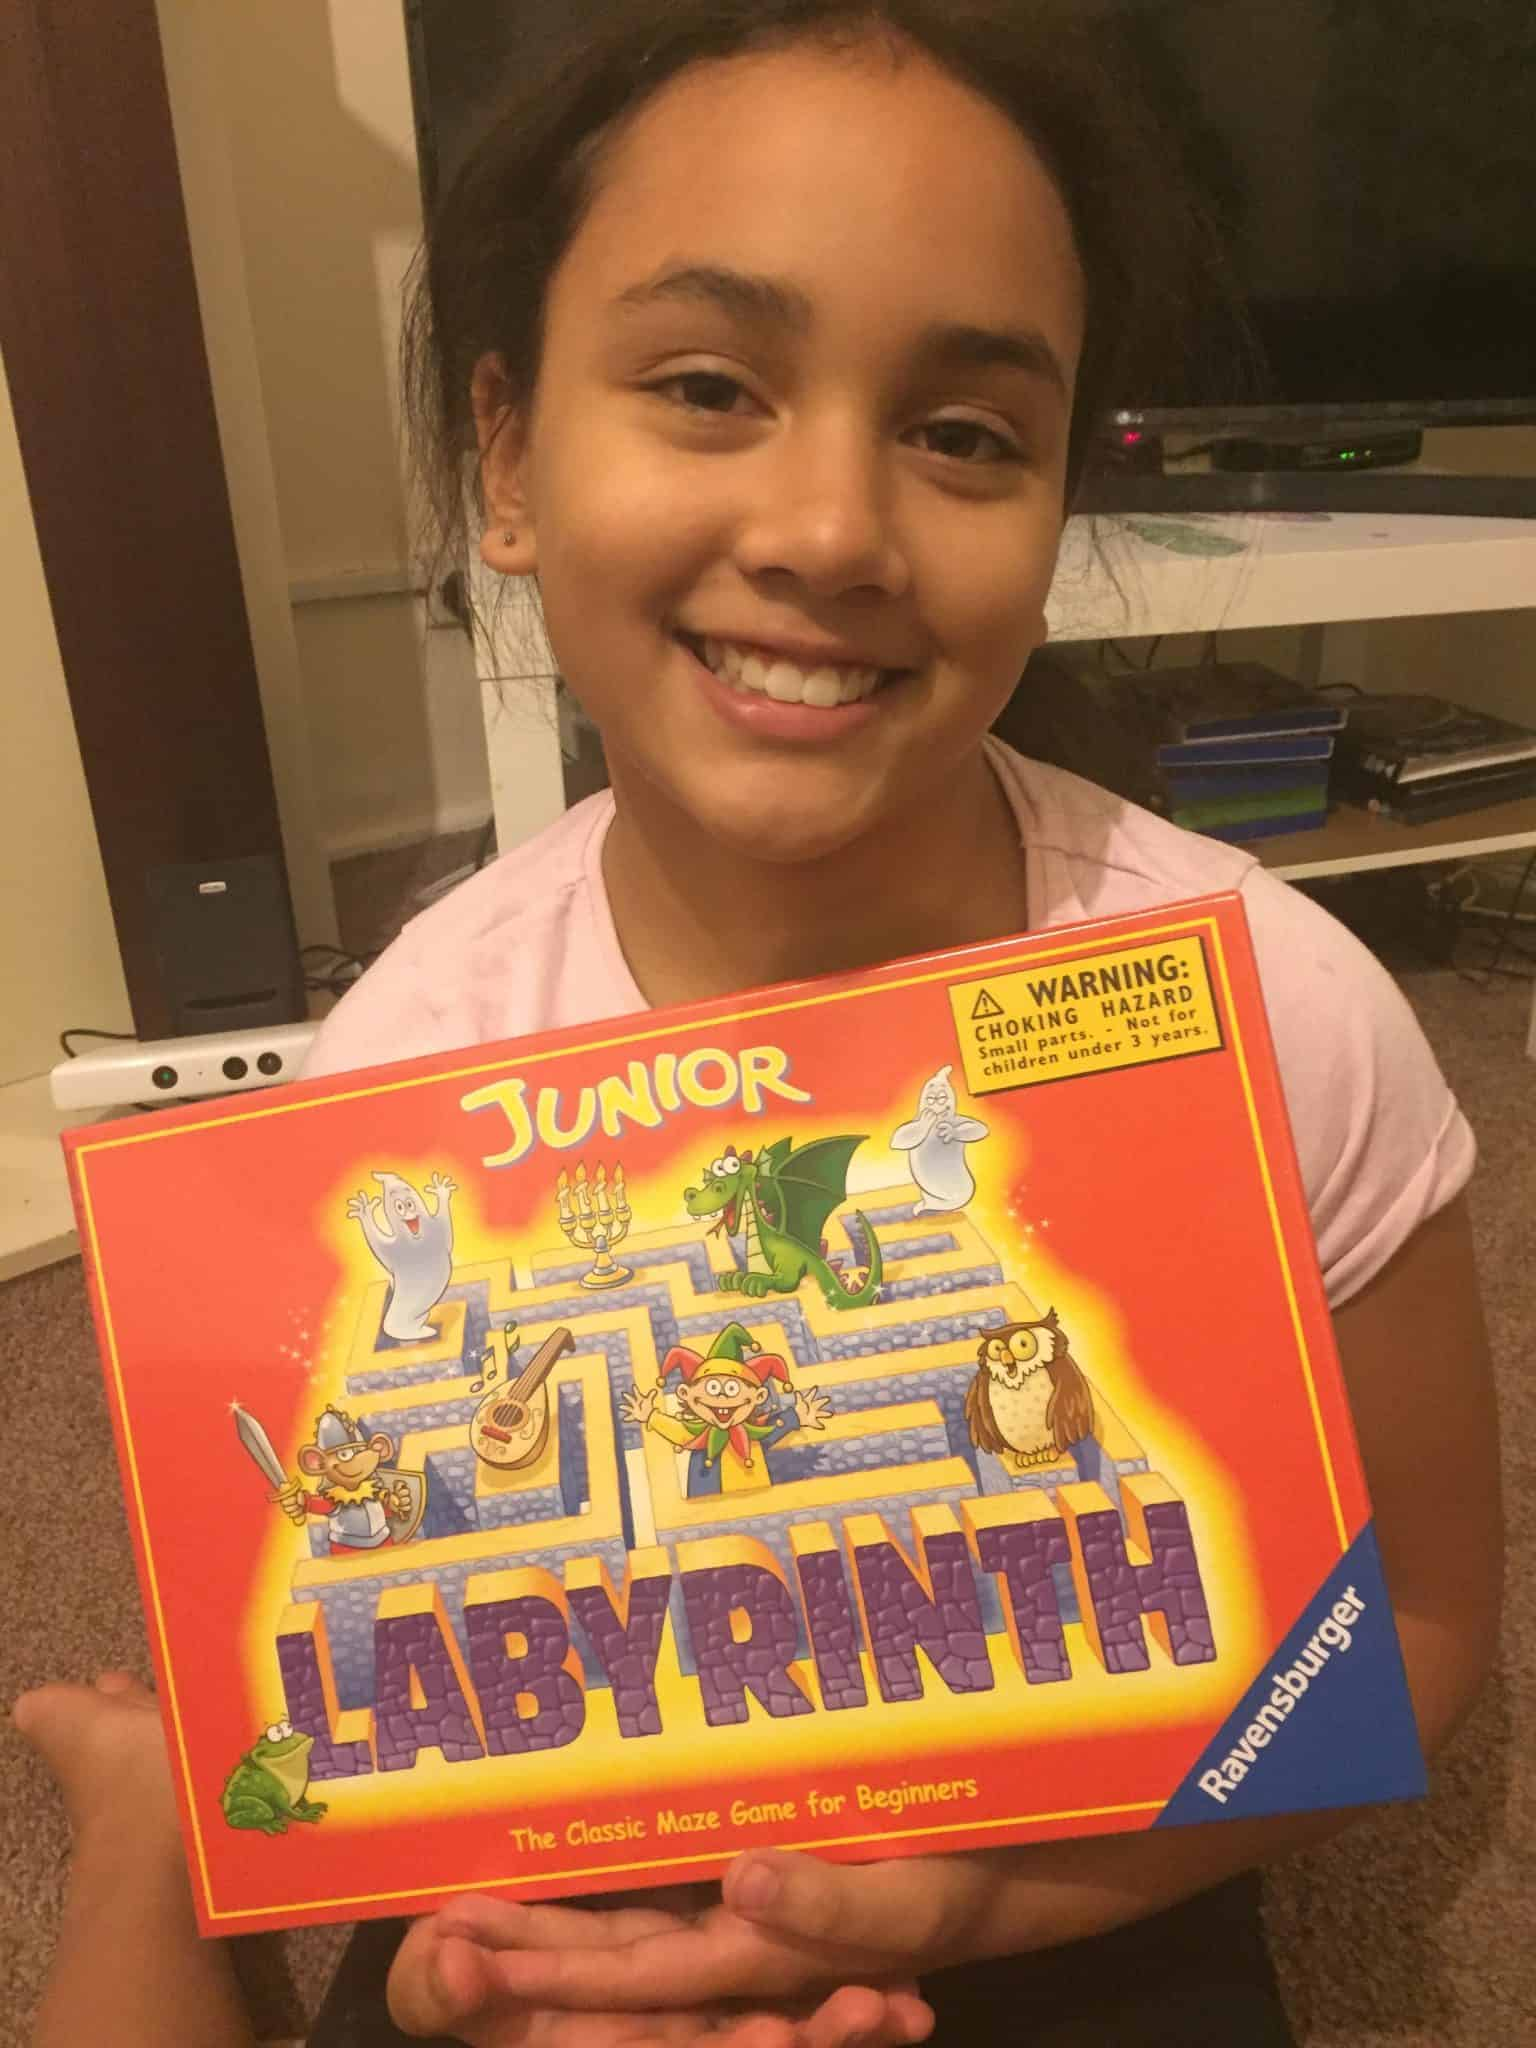 labyrinth game by ravensburger